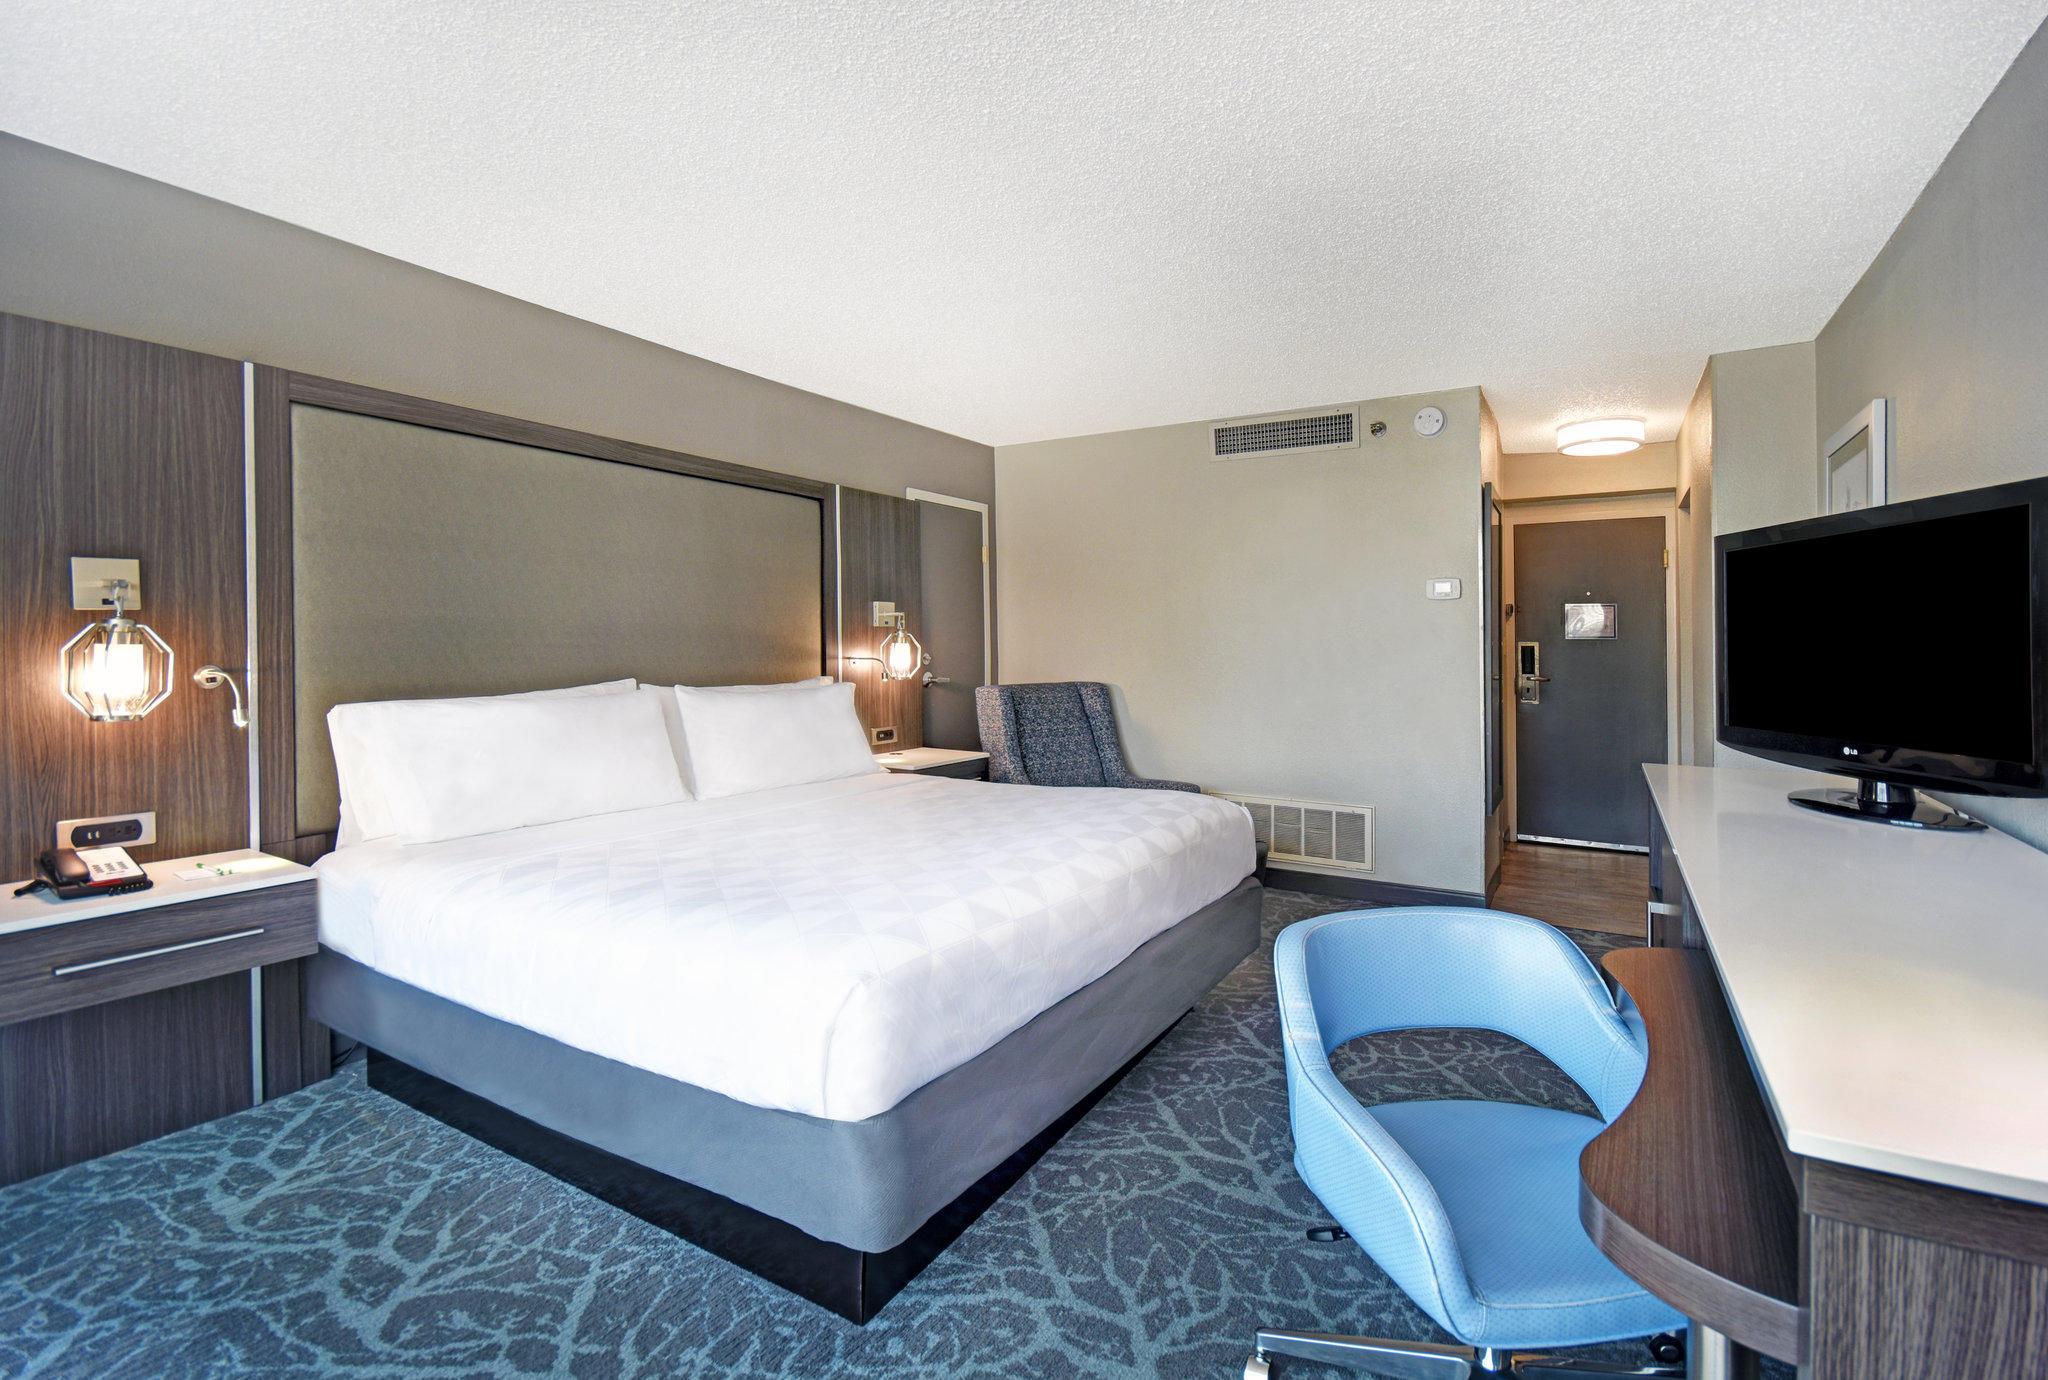 Holiday Inn Memphis-Downtown (Beale St.), an IHG Hotel